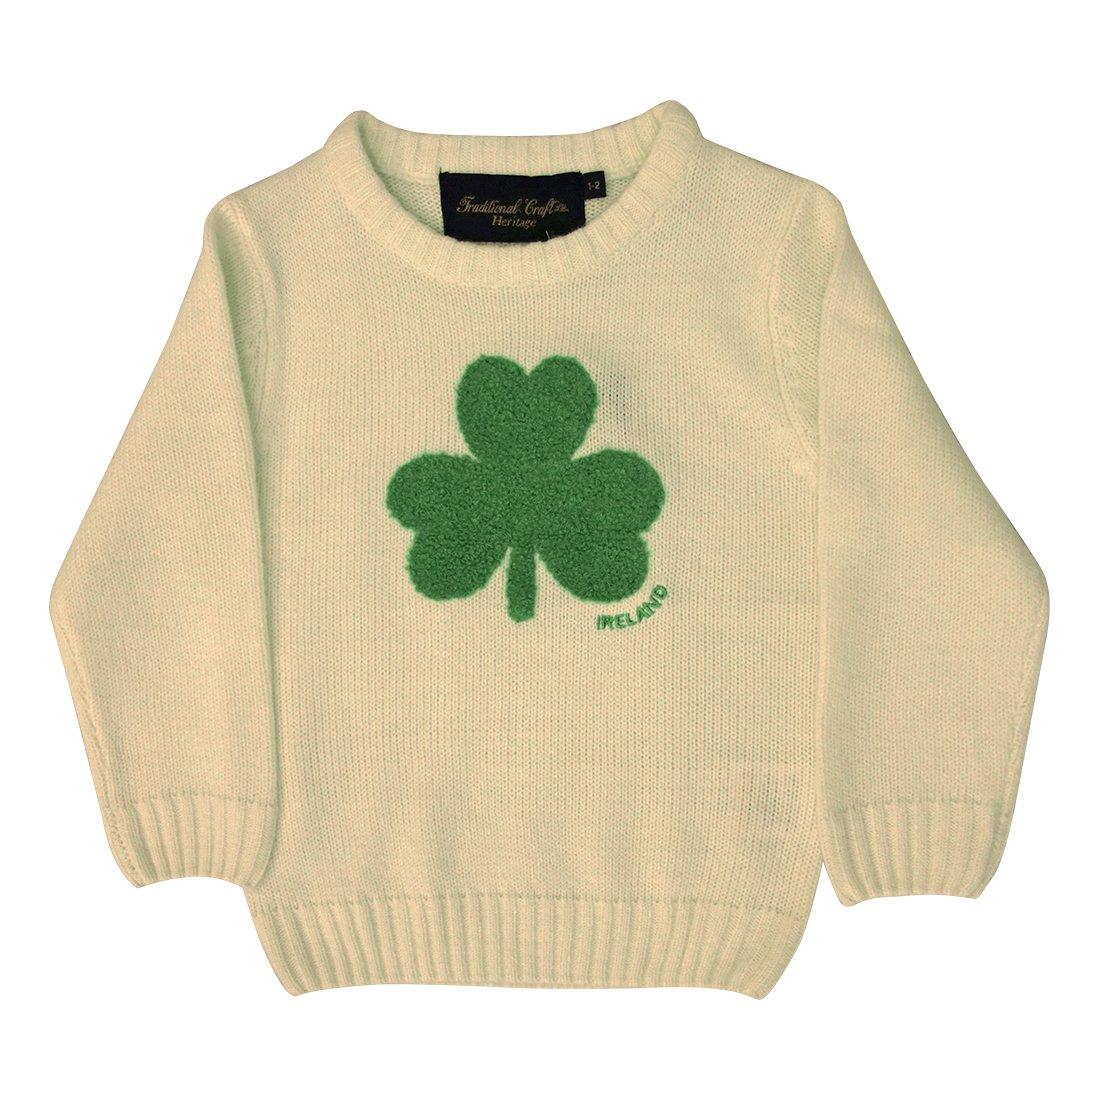 Other Brands Round Neck Ireland Kids Sweater with Fluffy Shamrock, Cream Colour